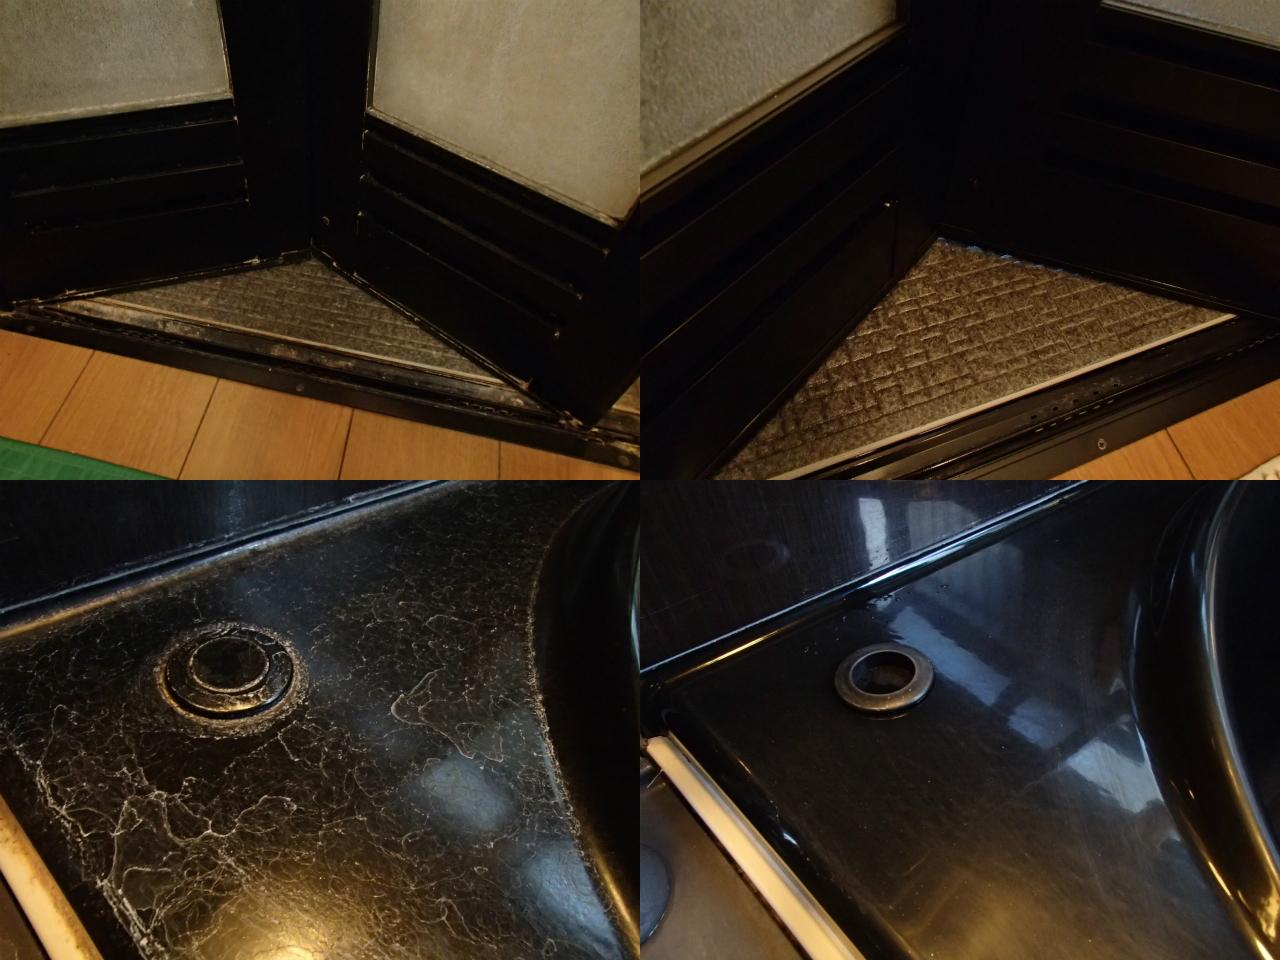 http://ajras.net/images/130122-bathroom.jpg